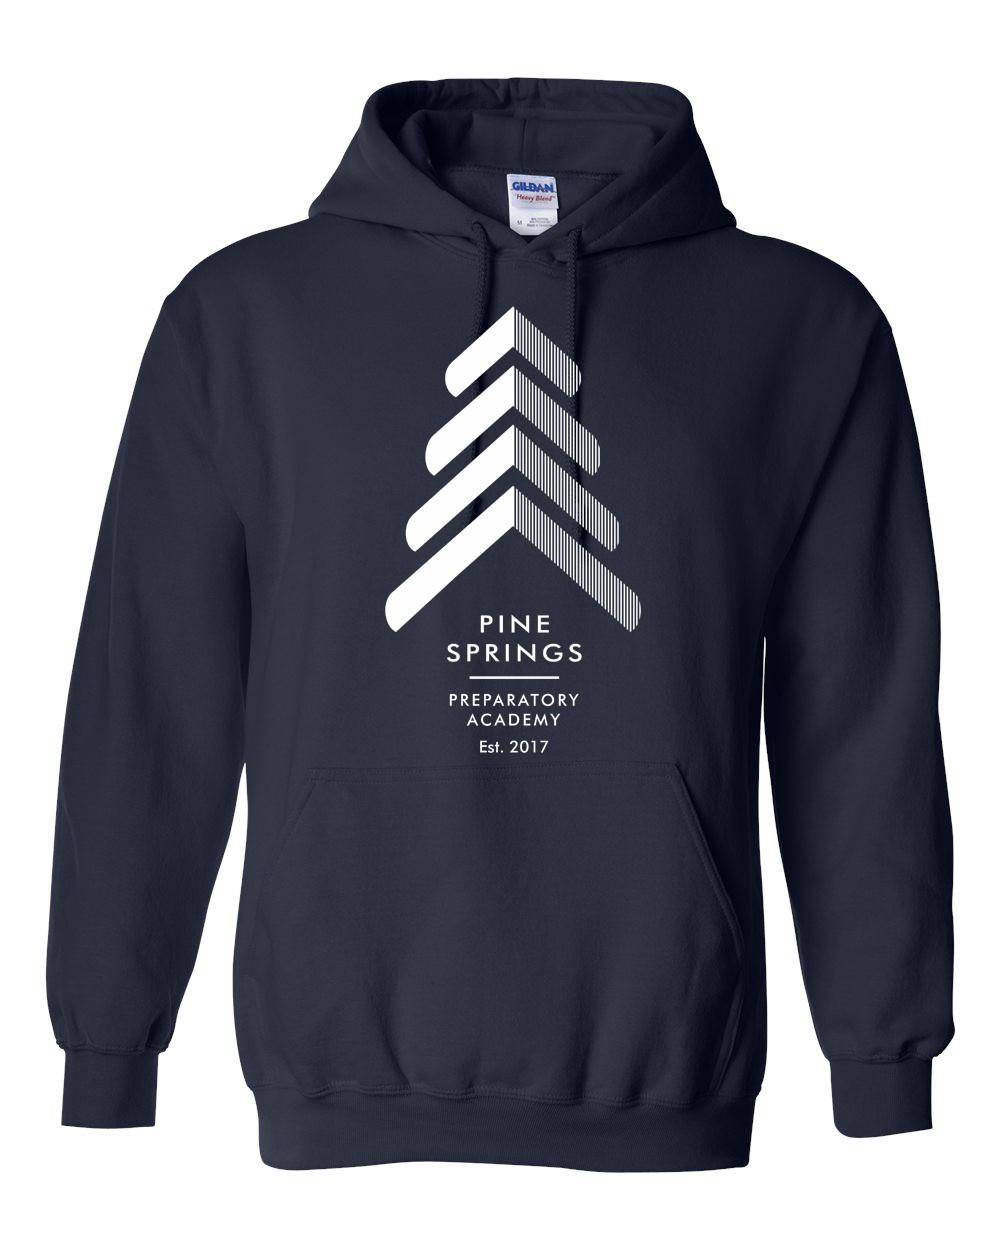 Pine Springs Soft Spun Cotton Pullover Hoodies